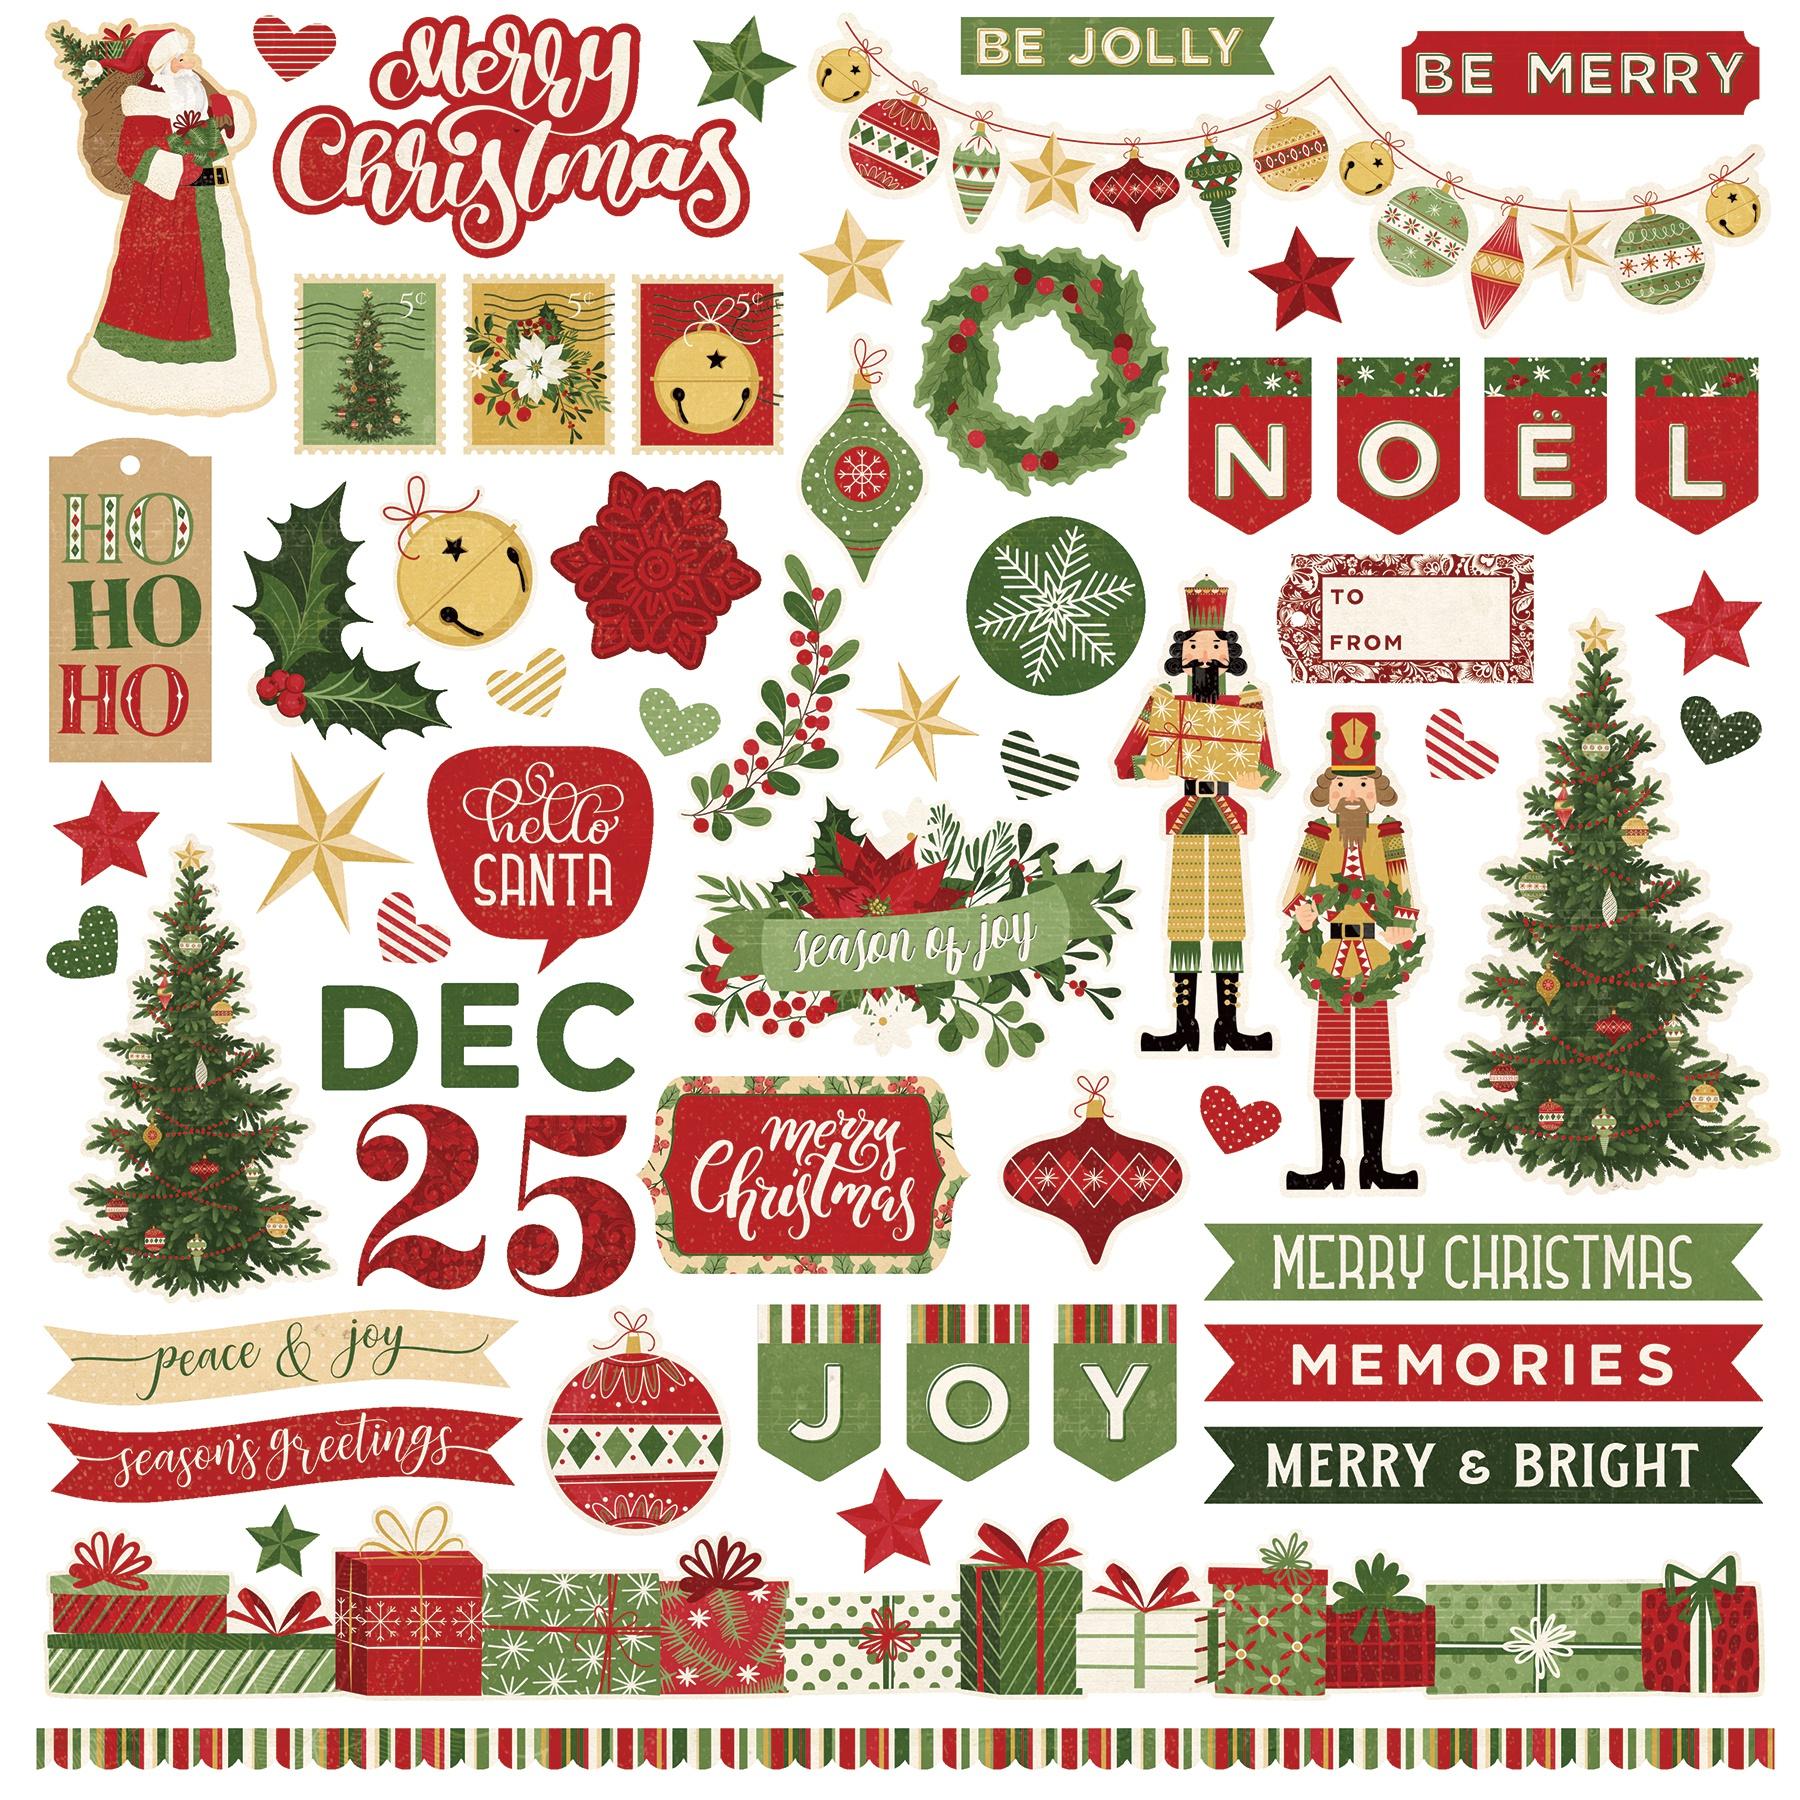 Christmas Memories Stickers 12X12-Elements